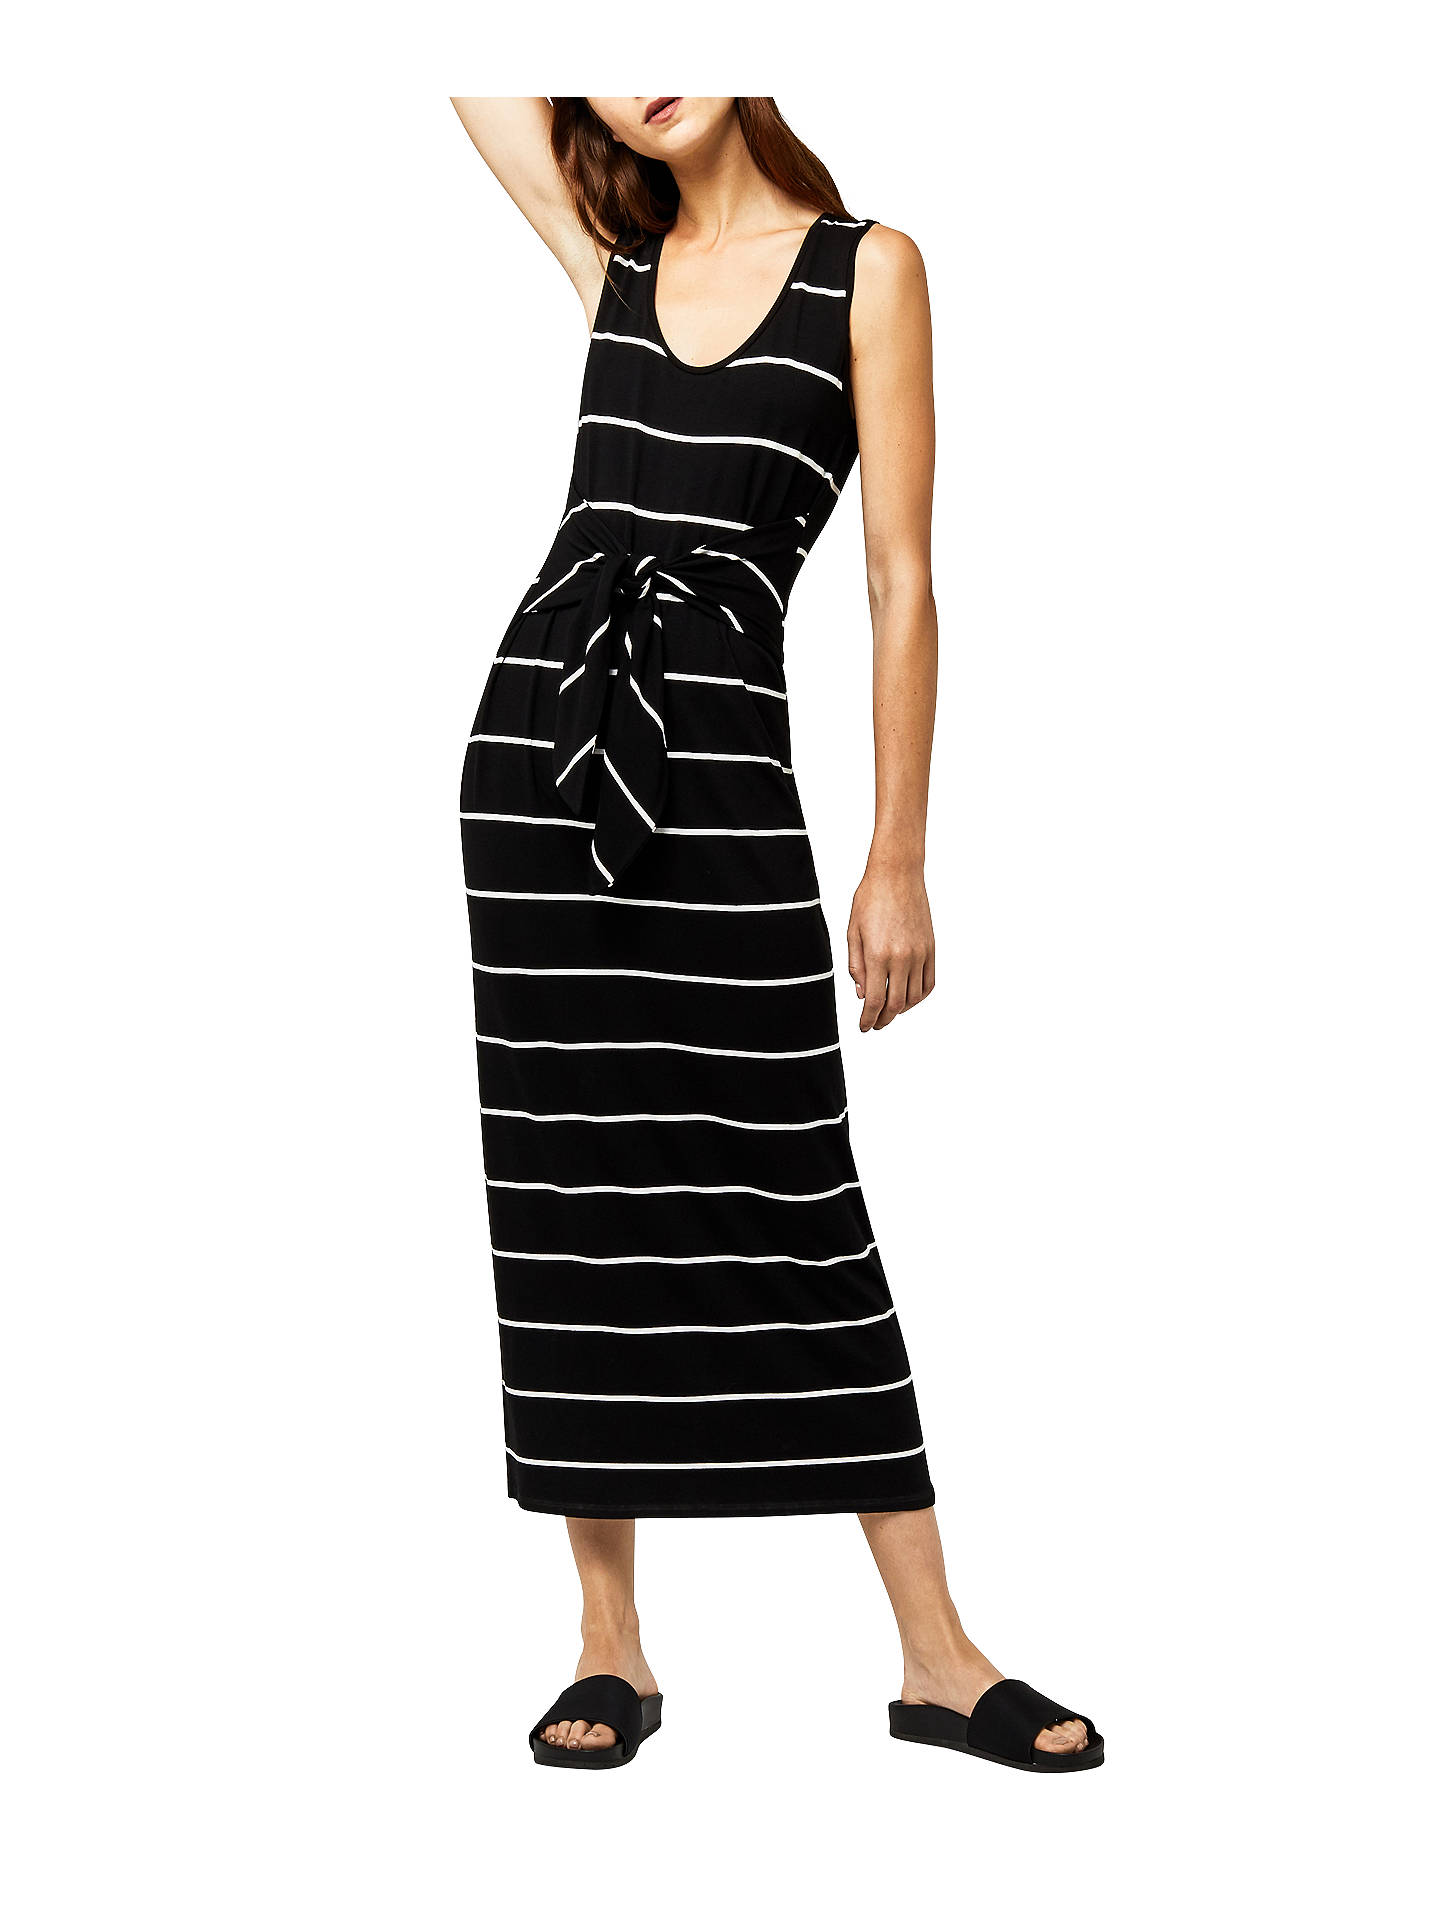 447e7c2e2ba1 Buy Warehouse Stripe Tie Front Maxi Dress, Black/White, 6 Online at  johnlewis ...